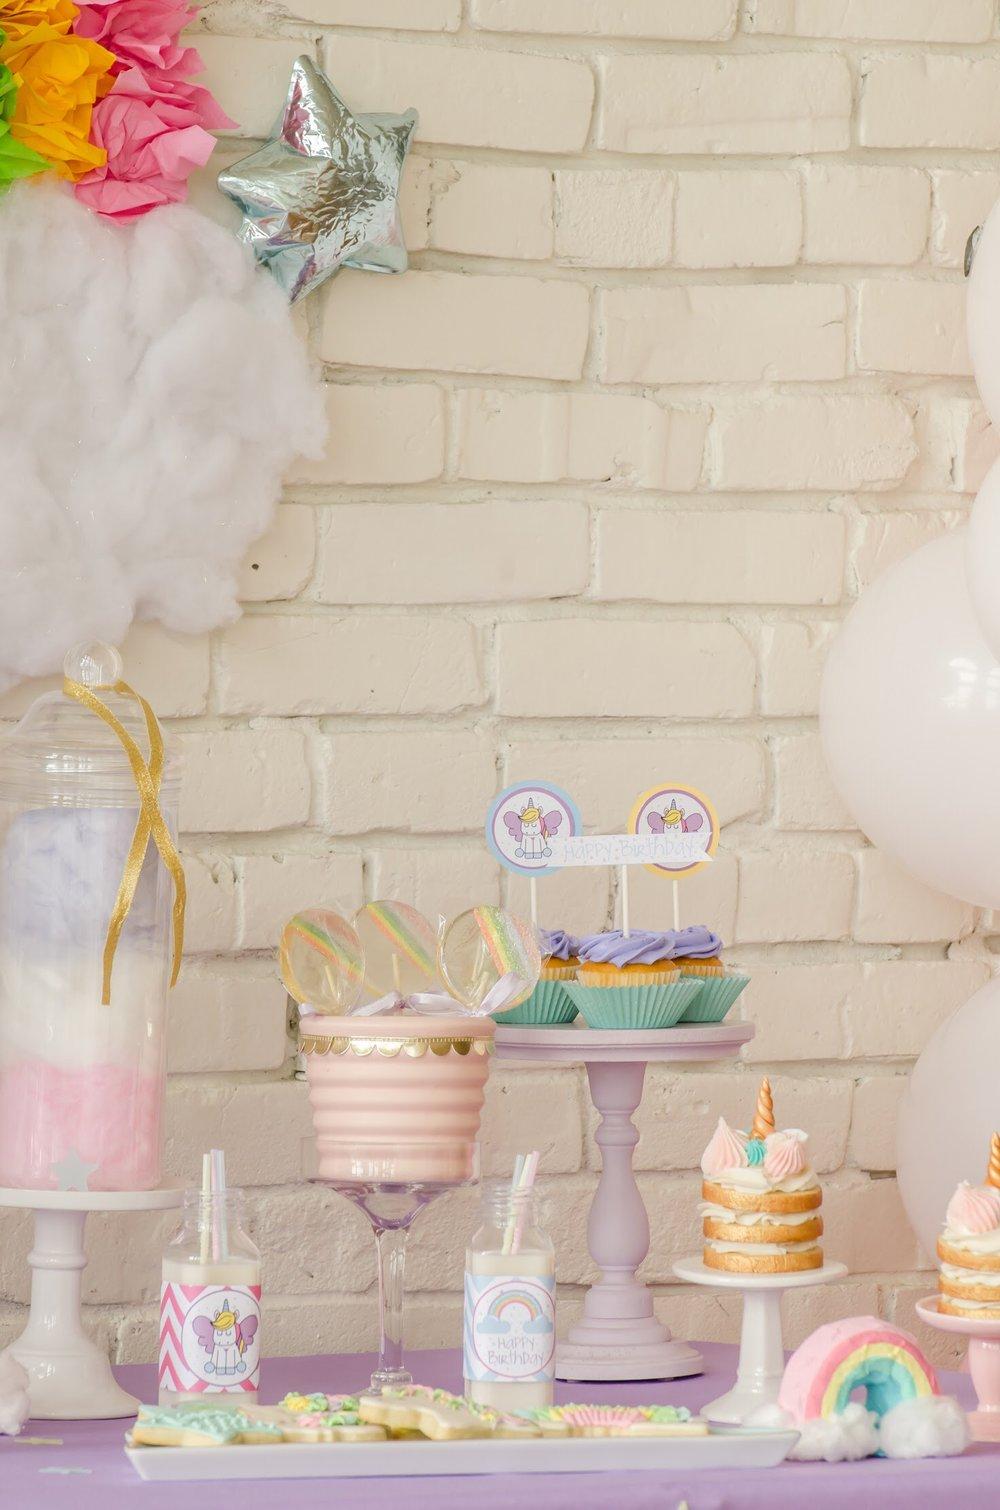 Unicorn themed birthday party dessert table from Mint Event Design www.minteventdesign.com #unicornparty #unicorncake #birthdayparty #birthdaypartyideas #birthdaydesserts #birthdaycake #desserttable